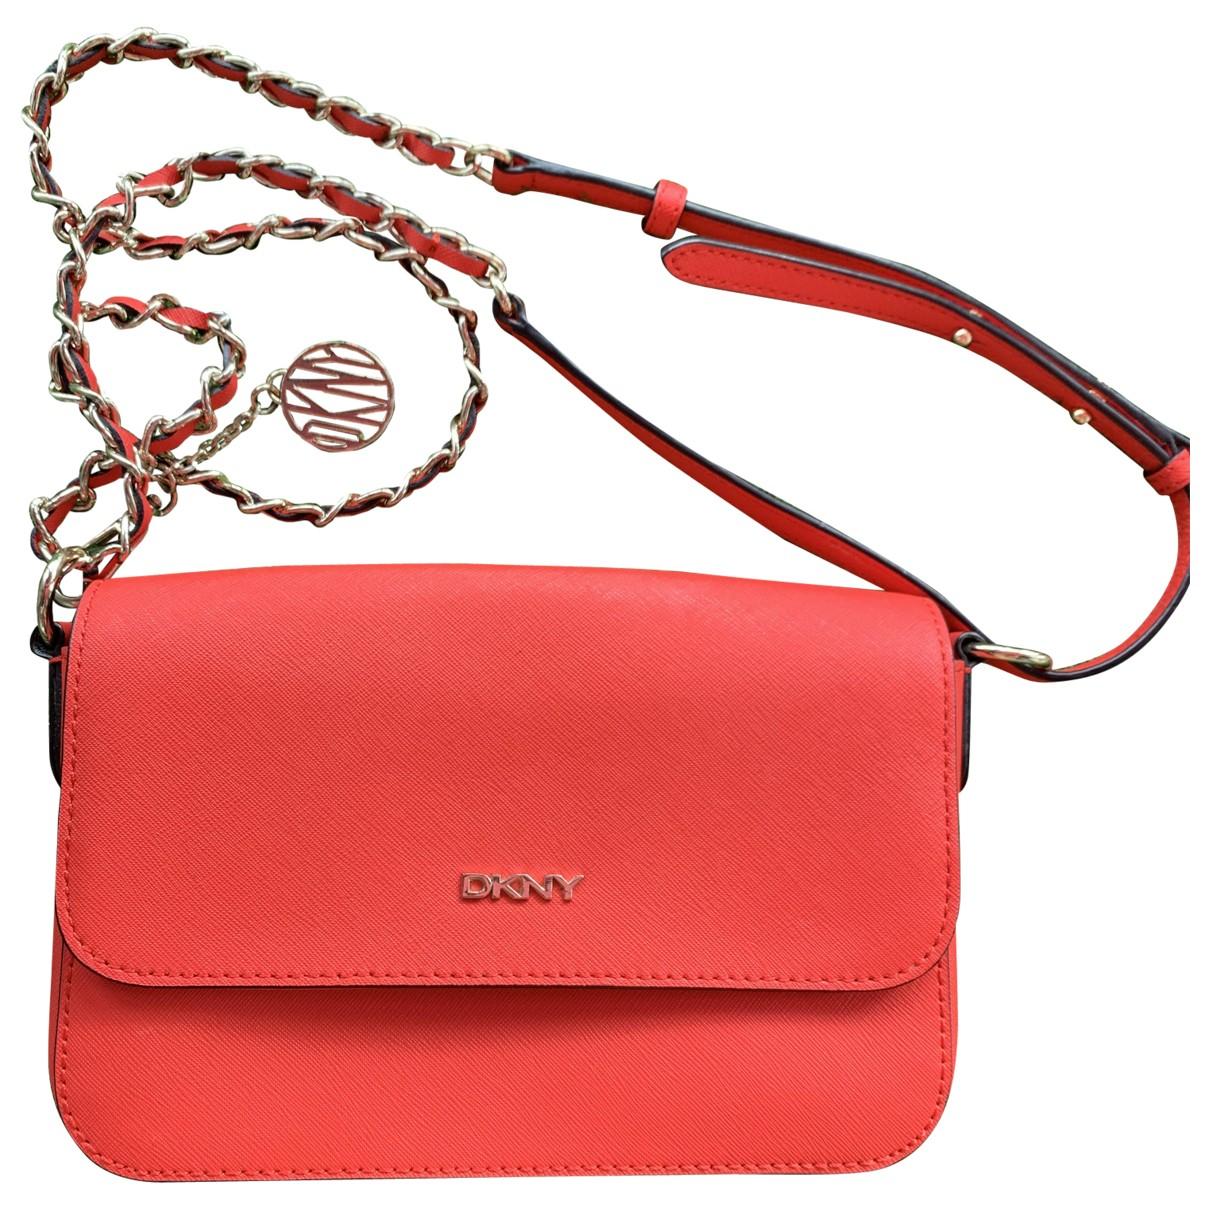 Donna Karan \N Orange Leather Clutch bag for Women \N